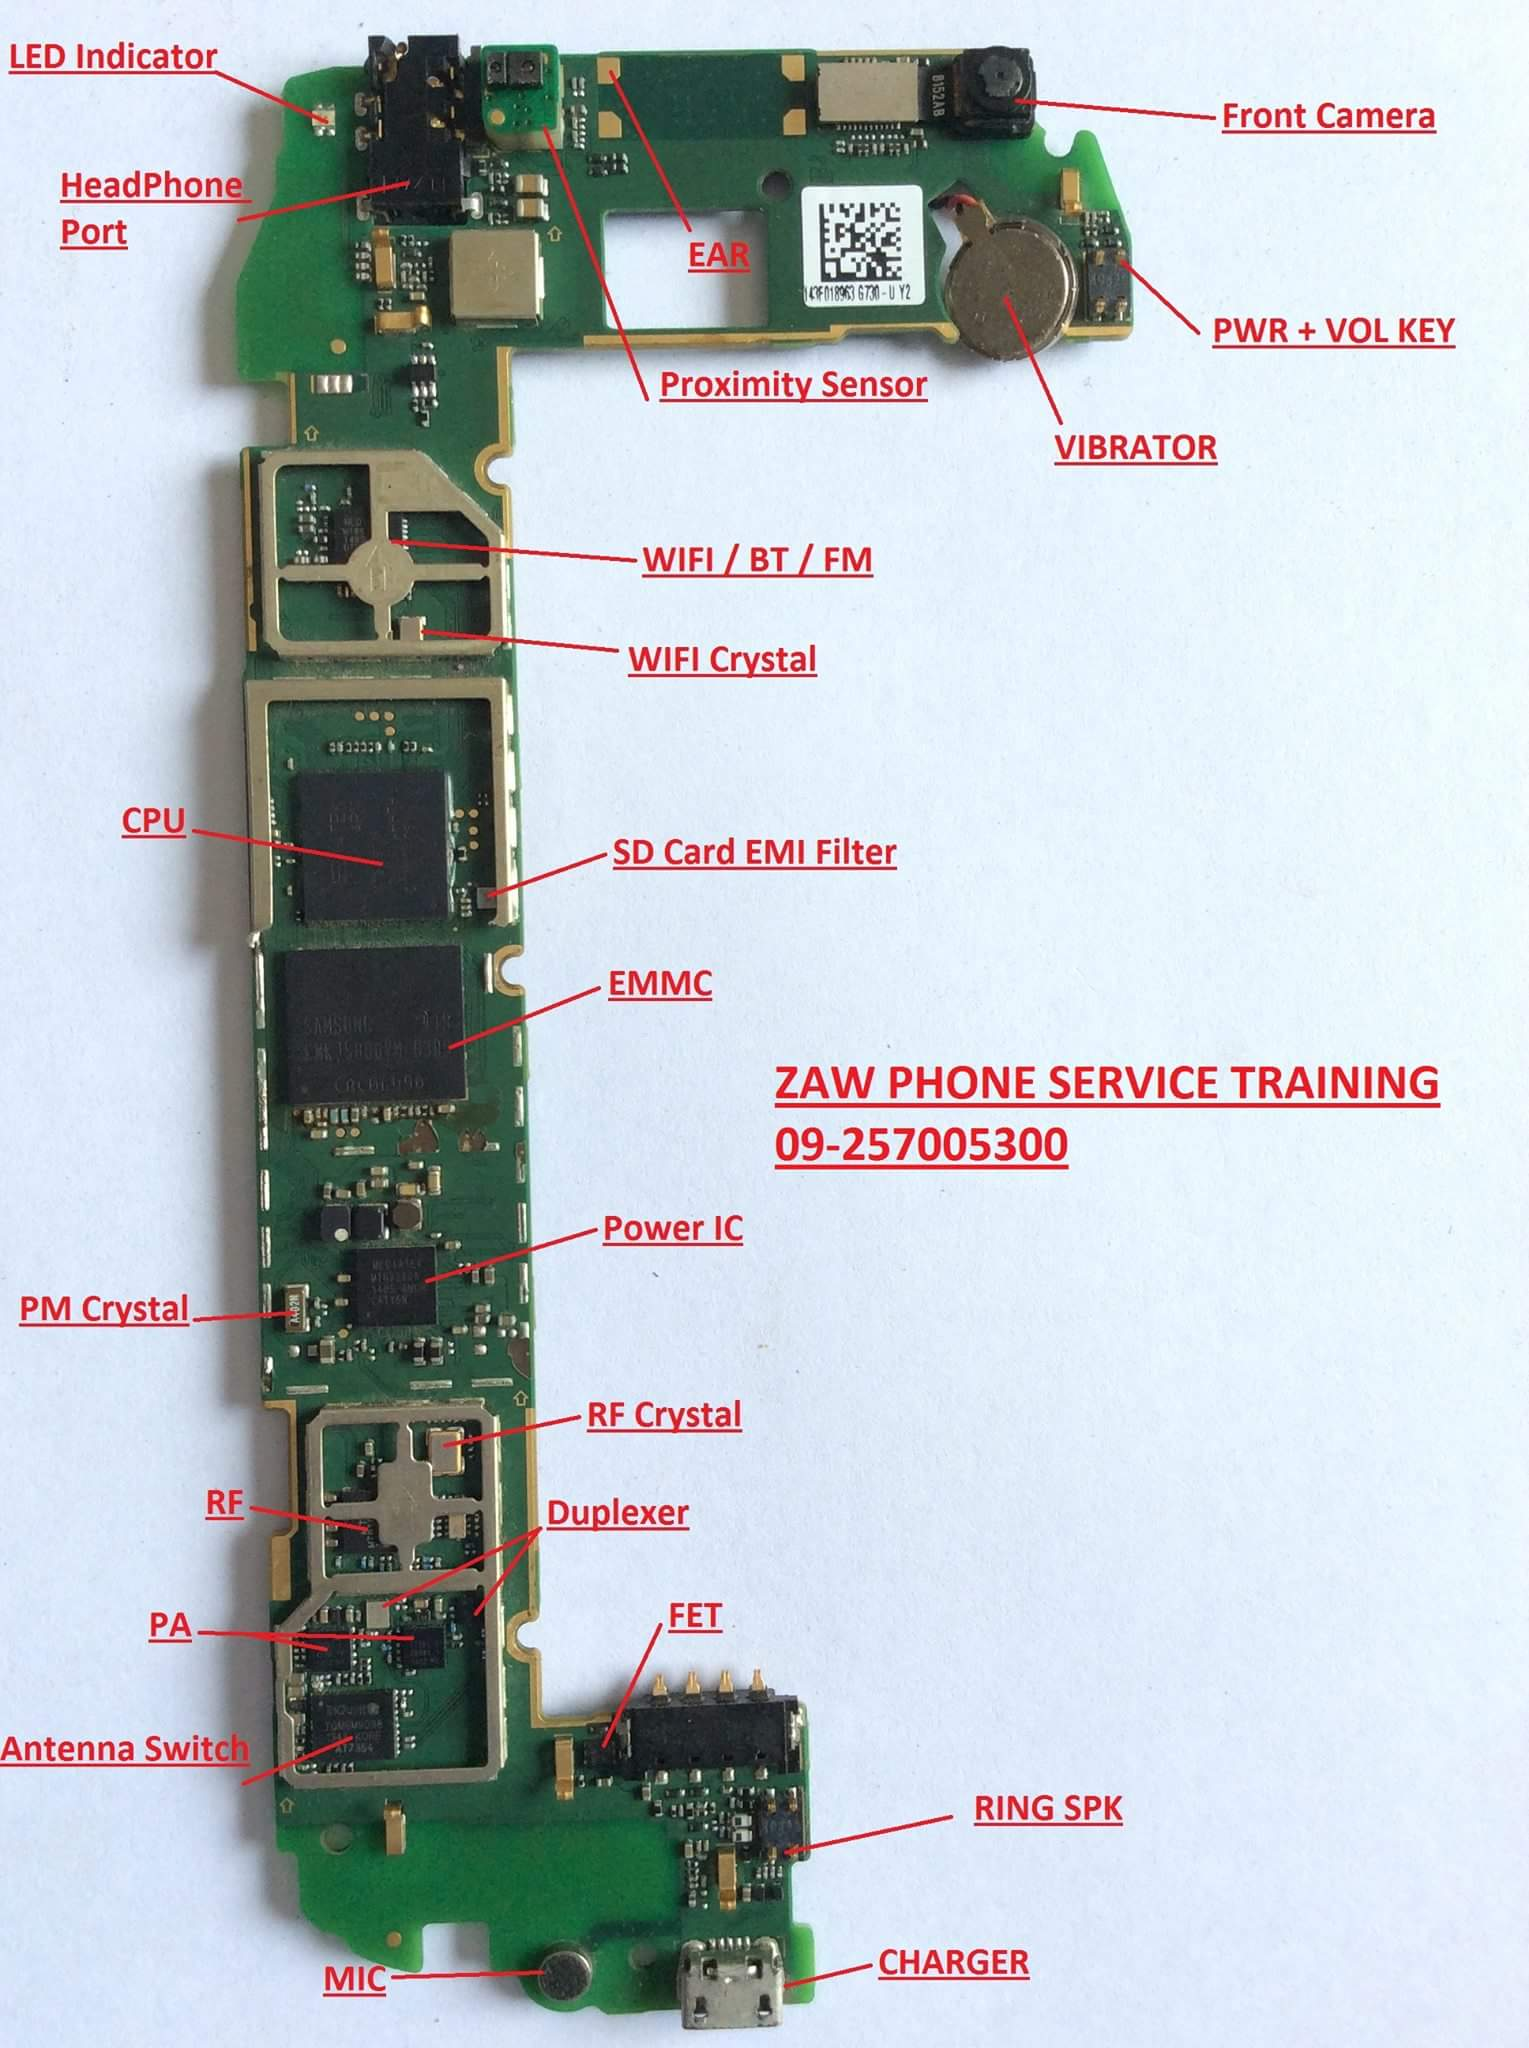 3A7266 Kia Sportage Trailer Wiring Harness | ePANEL Digital ... on jeep liberty wiring diagrams, vw touareg wiring diagrams, kia automotive wiring diagrams, kia radio wiring harness, maserati biturbo wiring diagrams, chevrolet colorado wiring diagrams, lotus elan wiring diagrams, bmw 528i wiring diagrams, kia optima wiring diagram, hyundai azera wiring diagrams, kia to boss wiring, mitsubishi pajero wiring diagrams, plymouth prowler wiring diagrams, bmw 5 series wiring diagrams, kia optima fuse diagram, mazda 626 wiring diagrams, mercedes c230 wiring diagrams, hyundai genesis sedan wiring diagrams, kia sedona wiring-diagram,